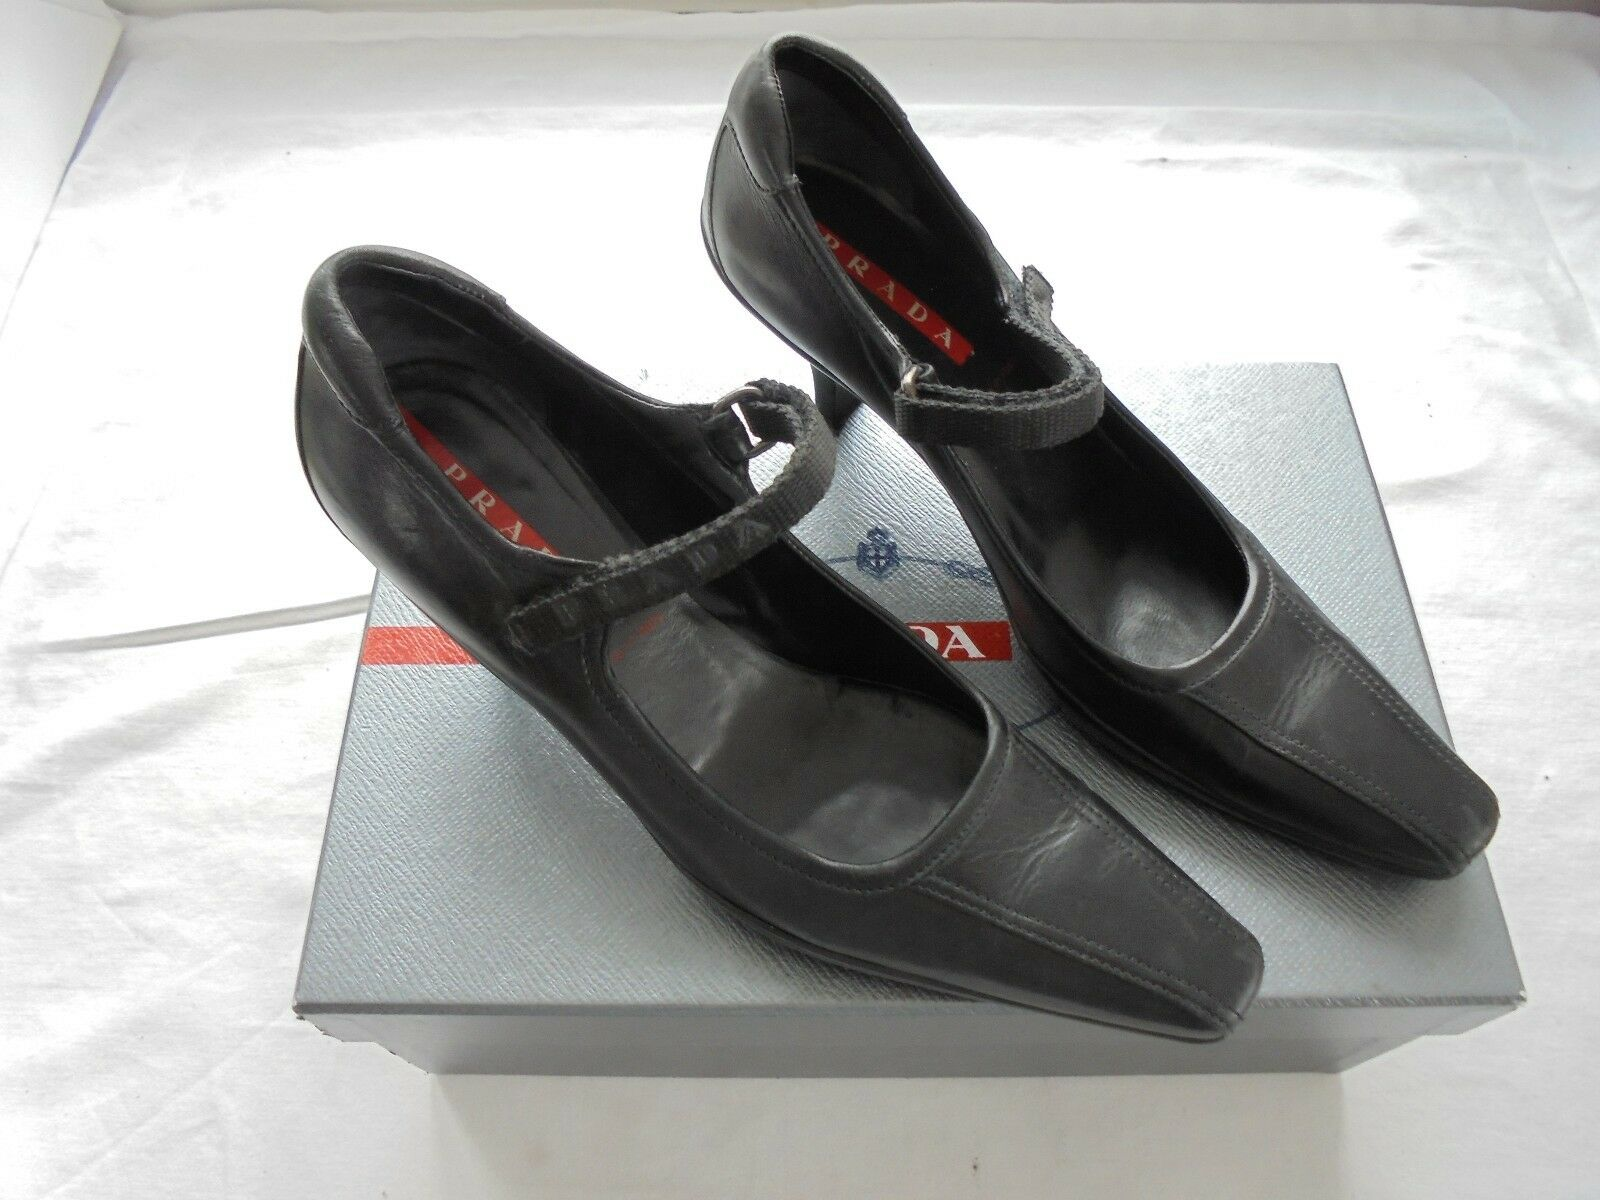 PRADA PELLE PUMPS NP:    Top Designer Scarpe Sandali Taglia 36 473bd1